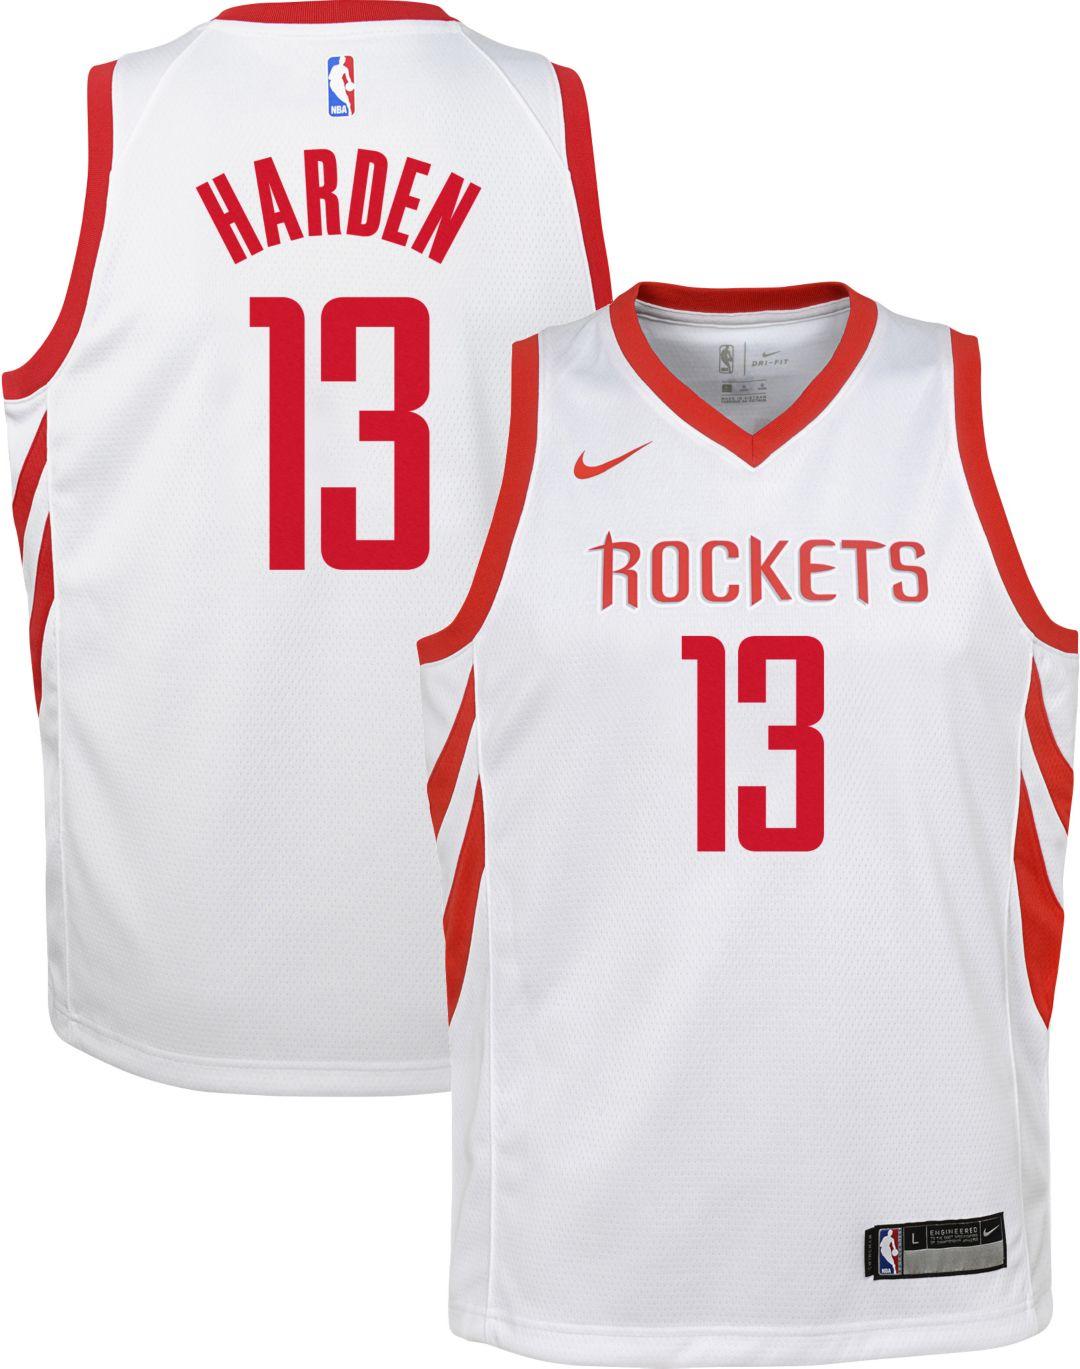 new styles 54b69 88951 houston rockets james harden jersey